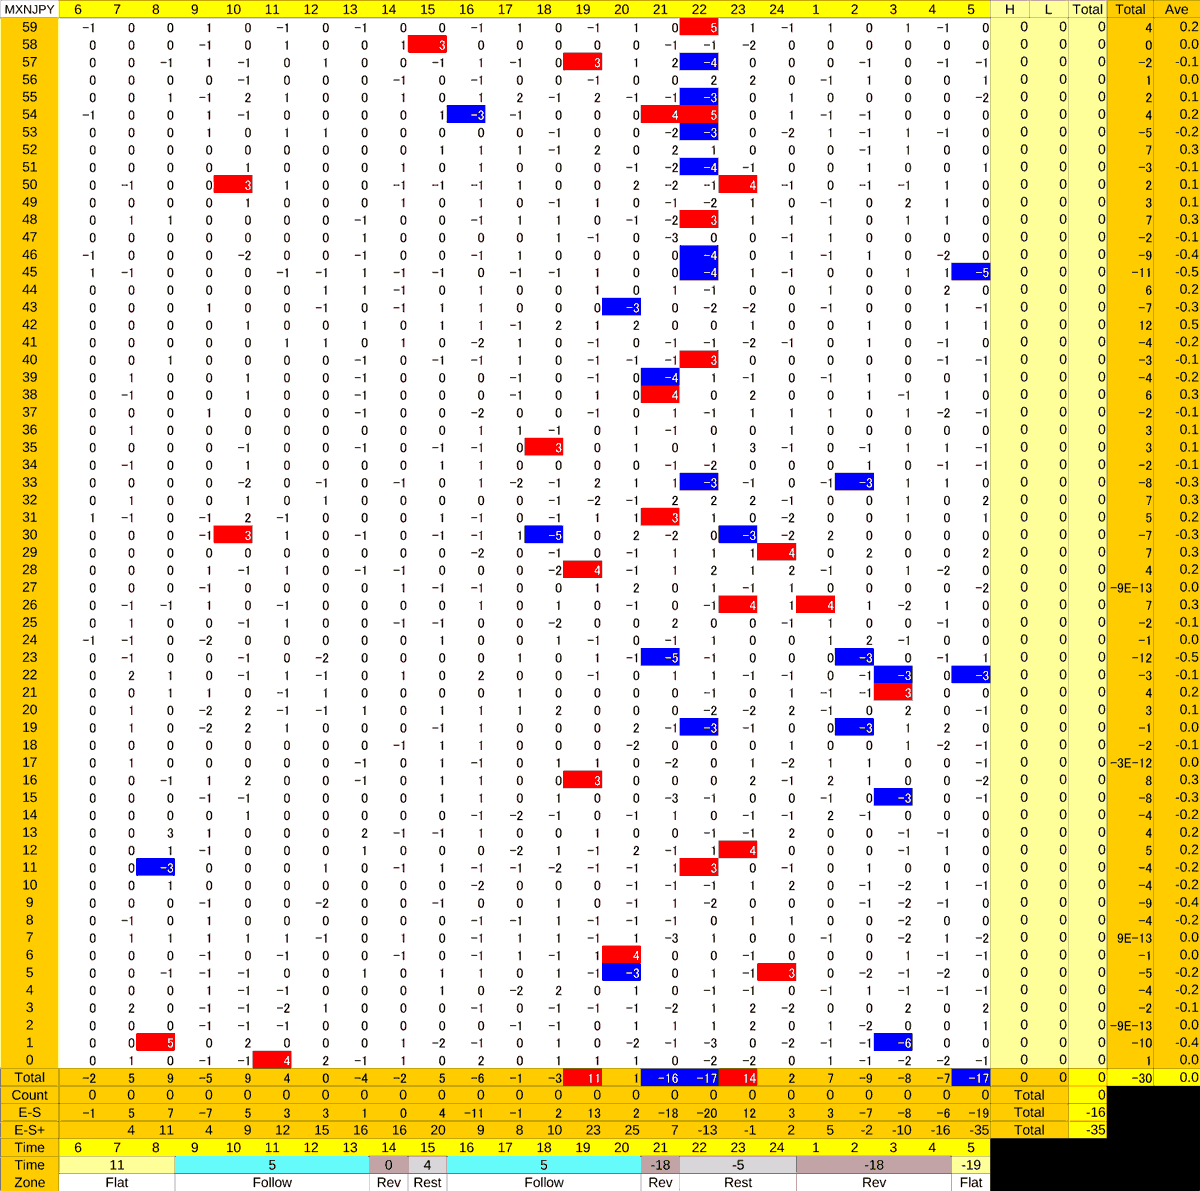 20200915_HS(3)MXNJPY